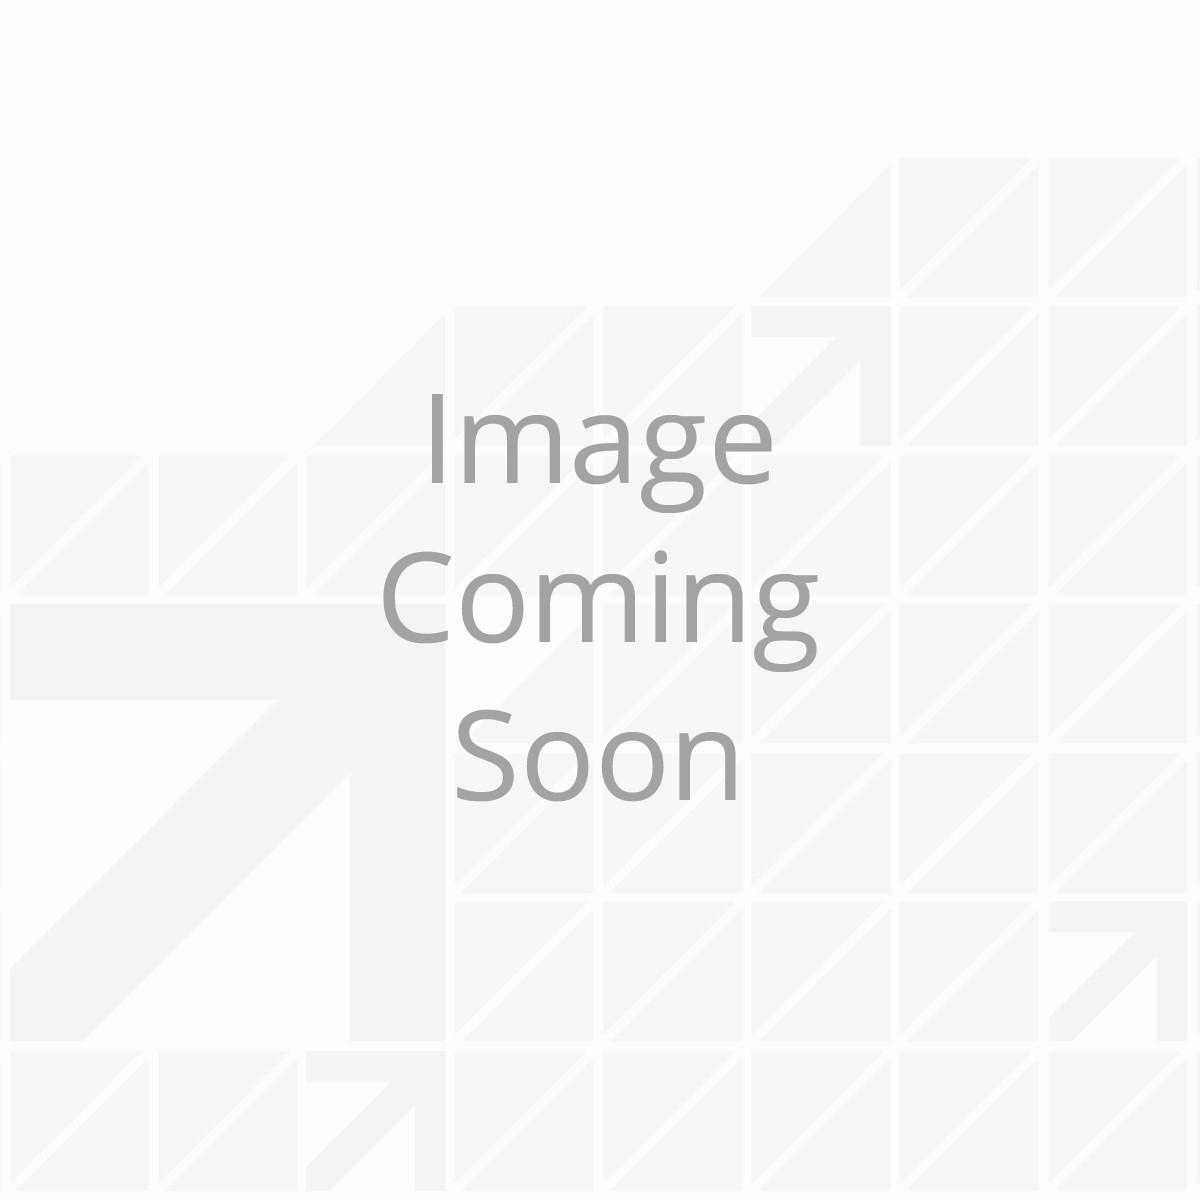 IG-42; 10mm Motor; Schwintek? In-Wall Slide-Out